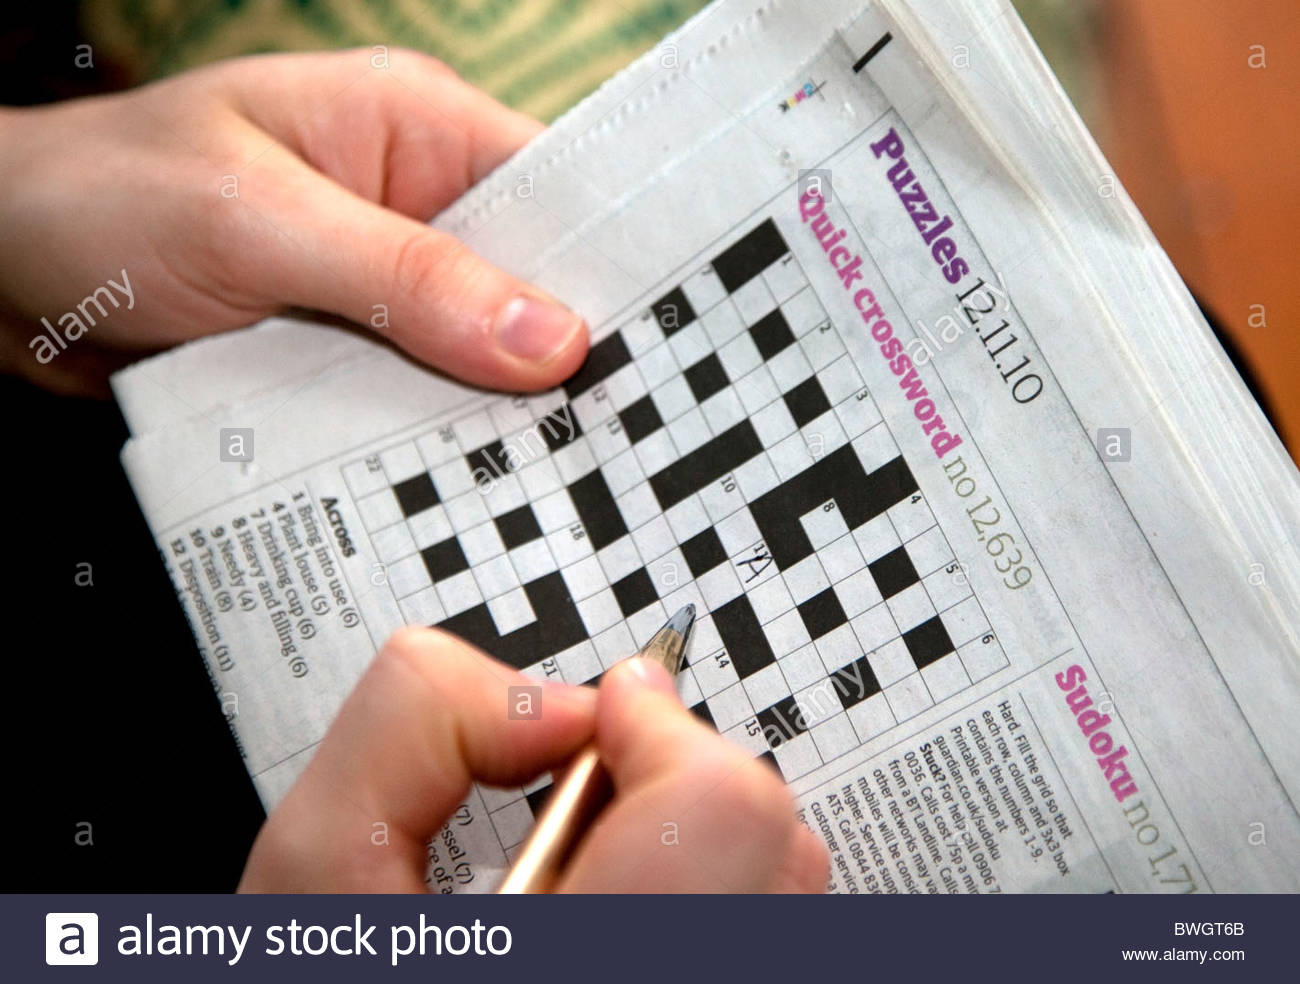 Solving A Quick Newspaper Crossword, London Stock Photo: 32946995 - Guardian Printable Quick Crossword